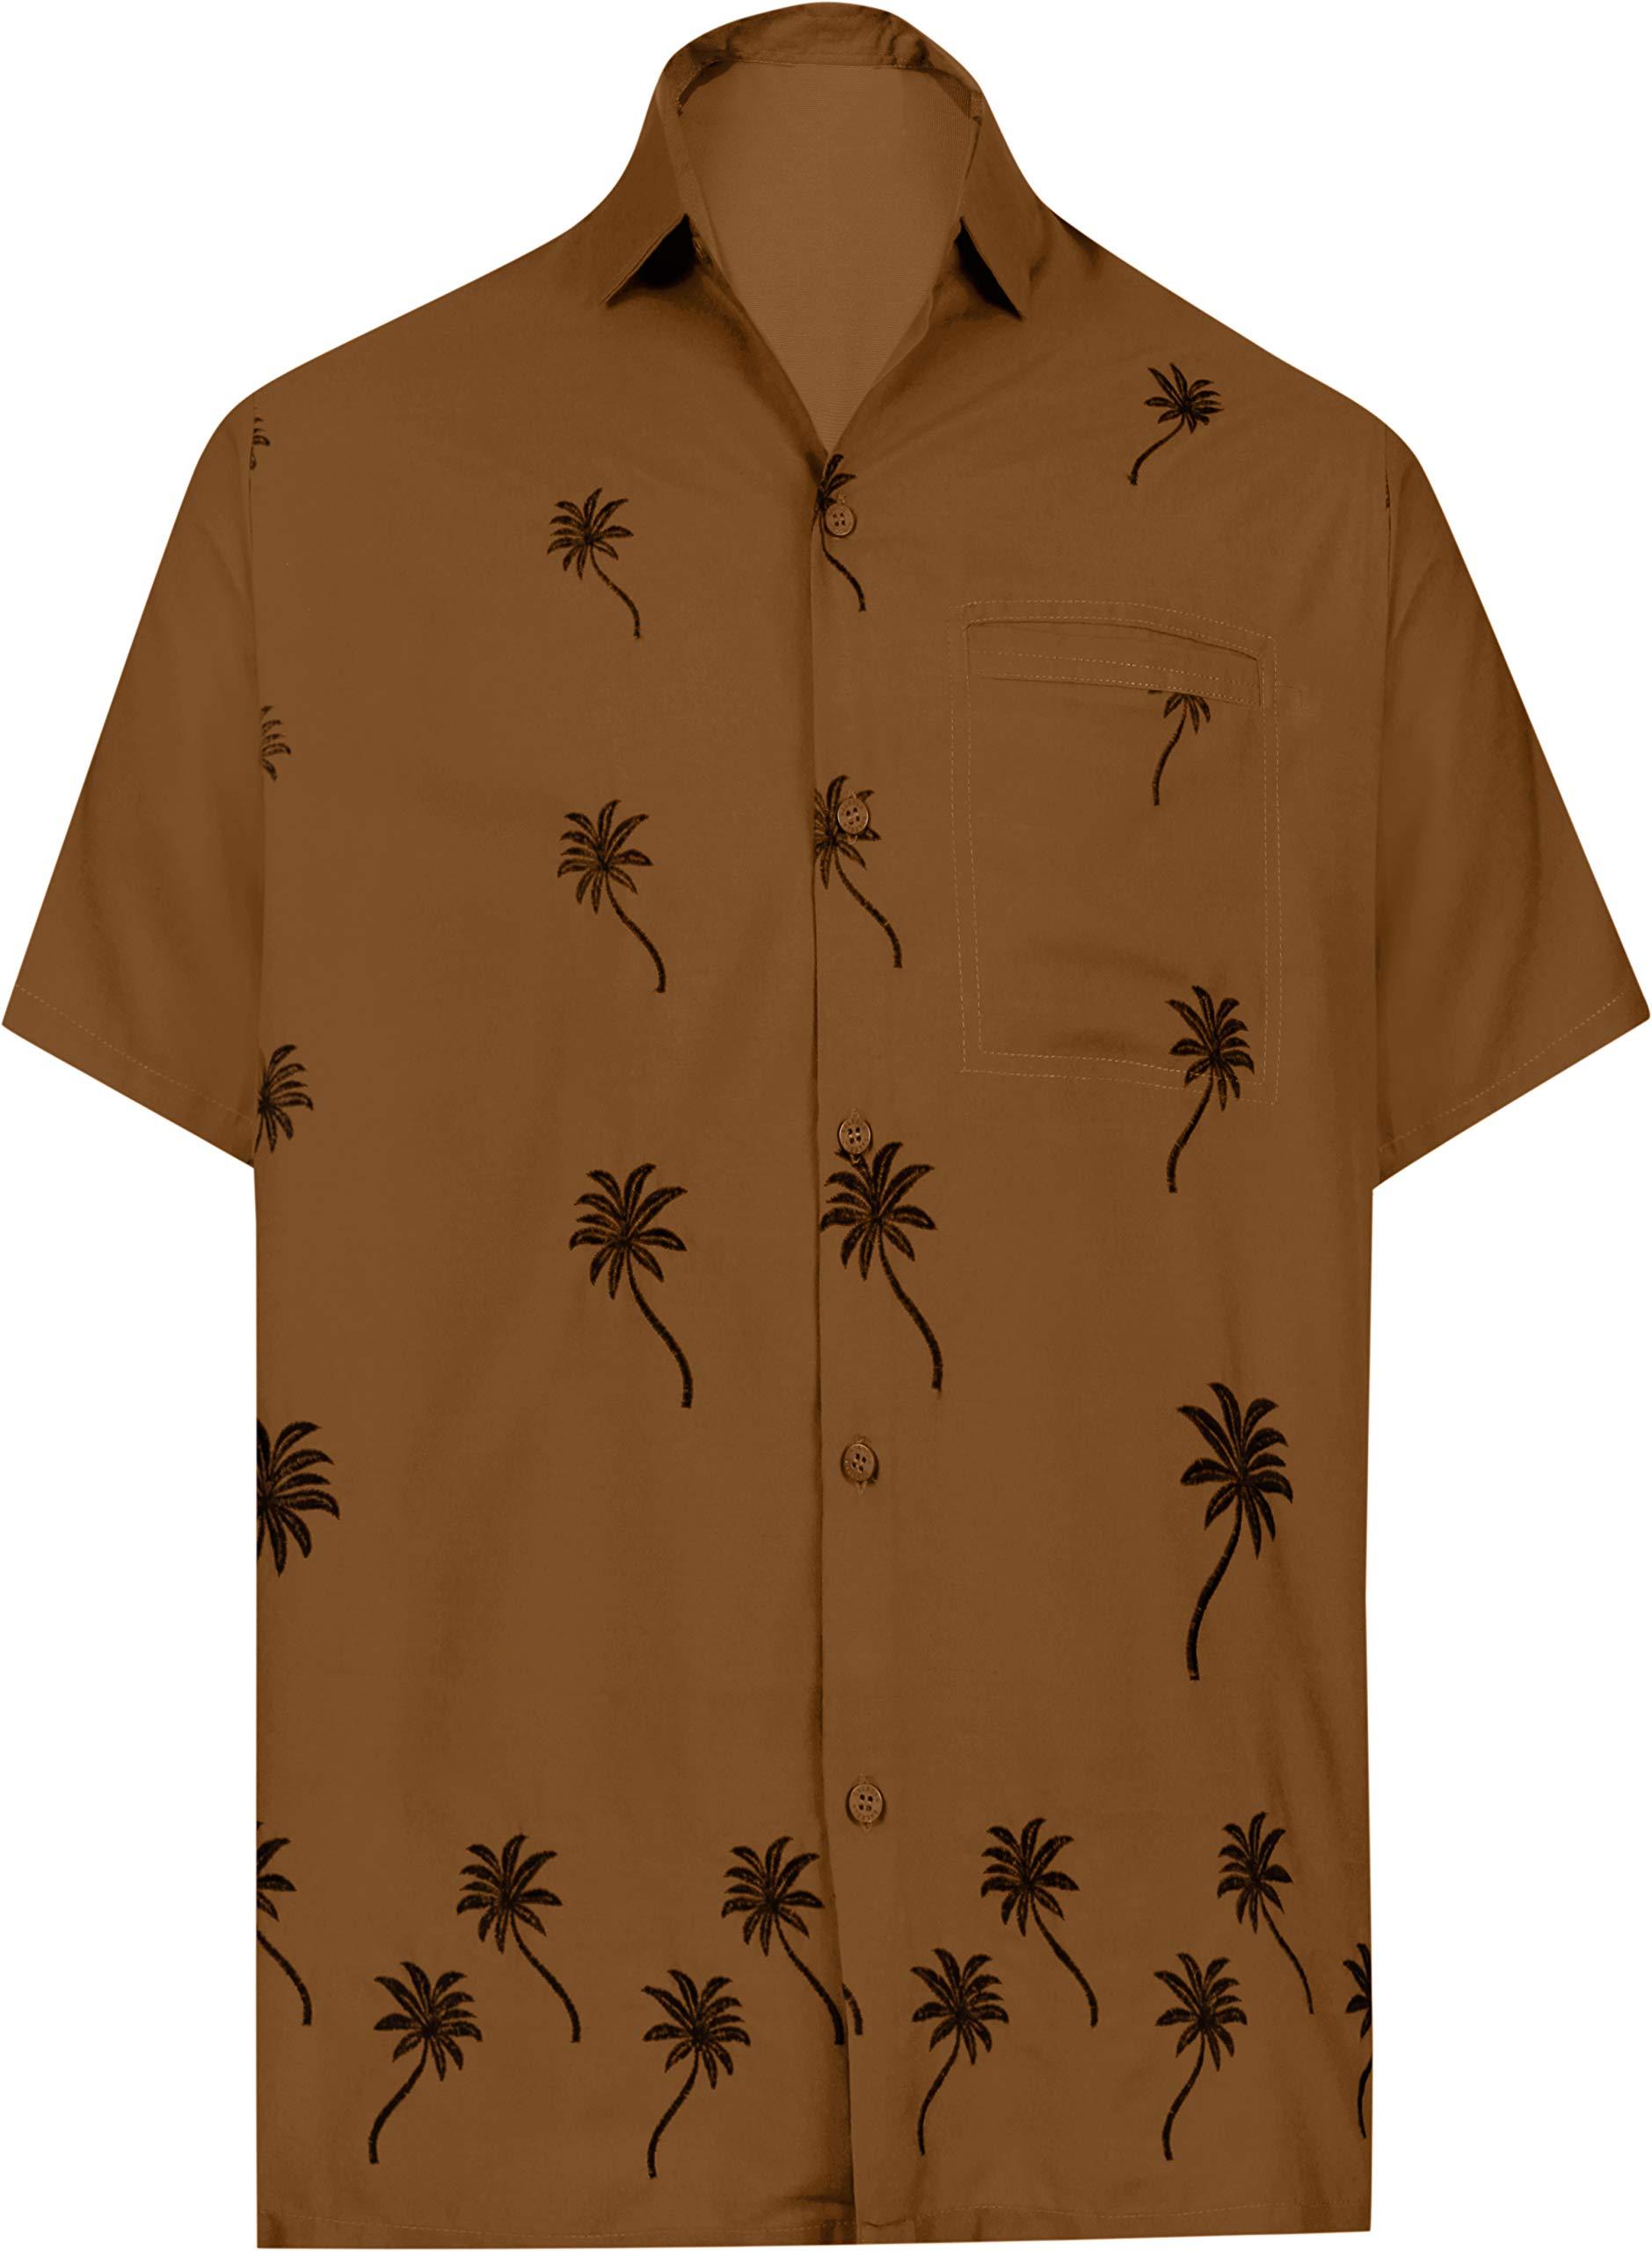 LA LEELA Men's Relaxed Tropical Hawaiian Shirt